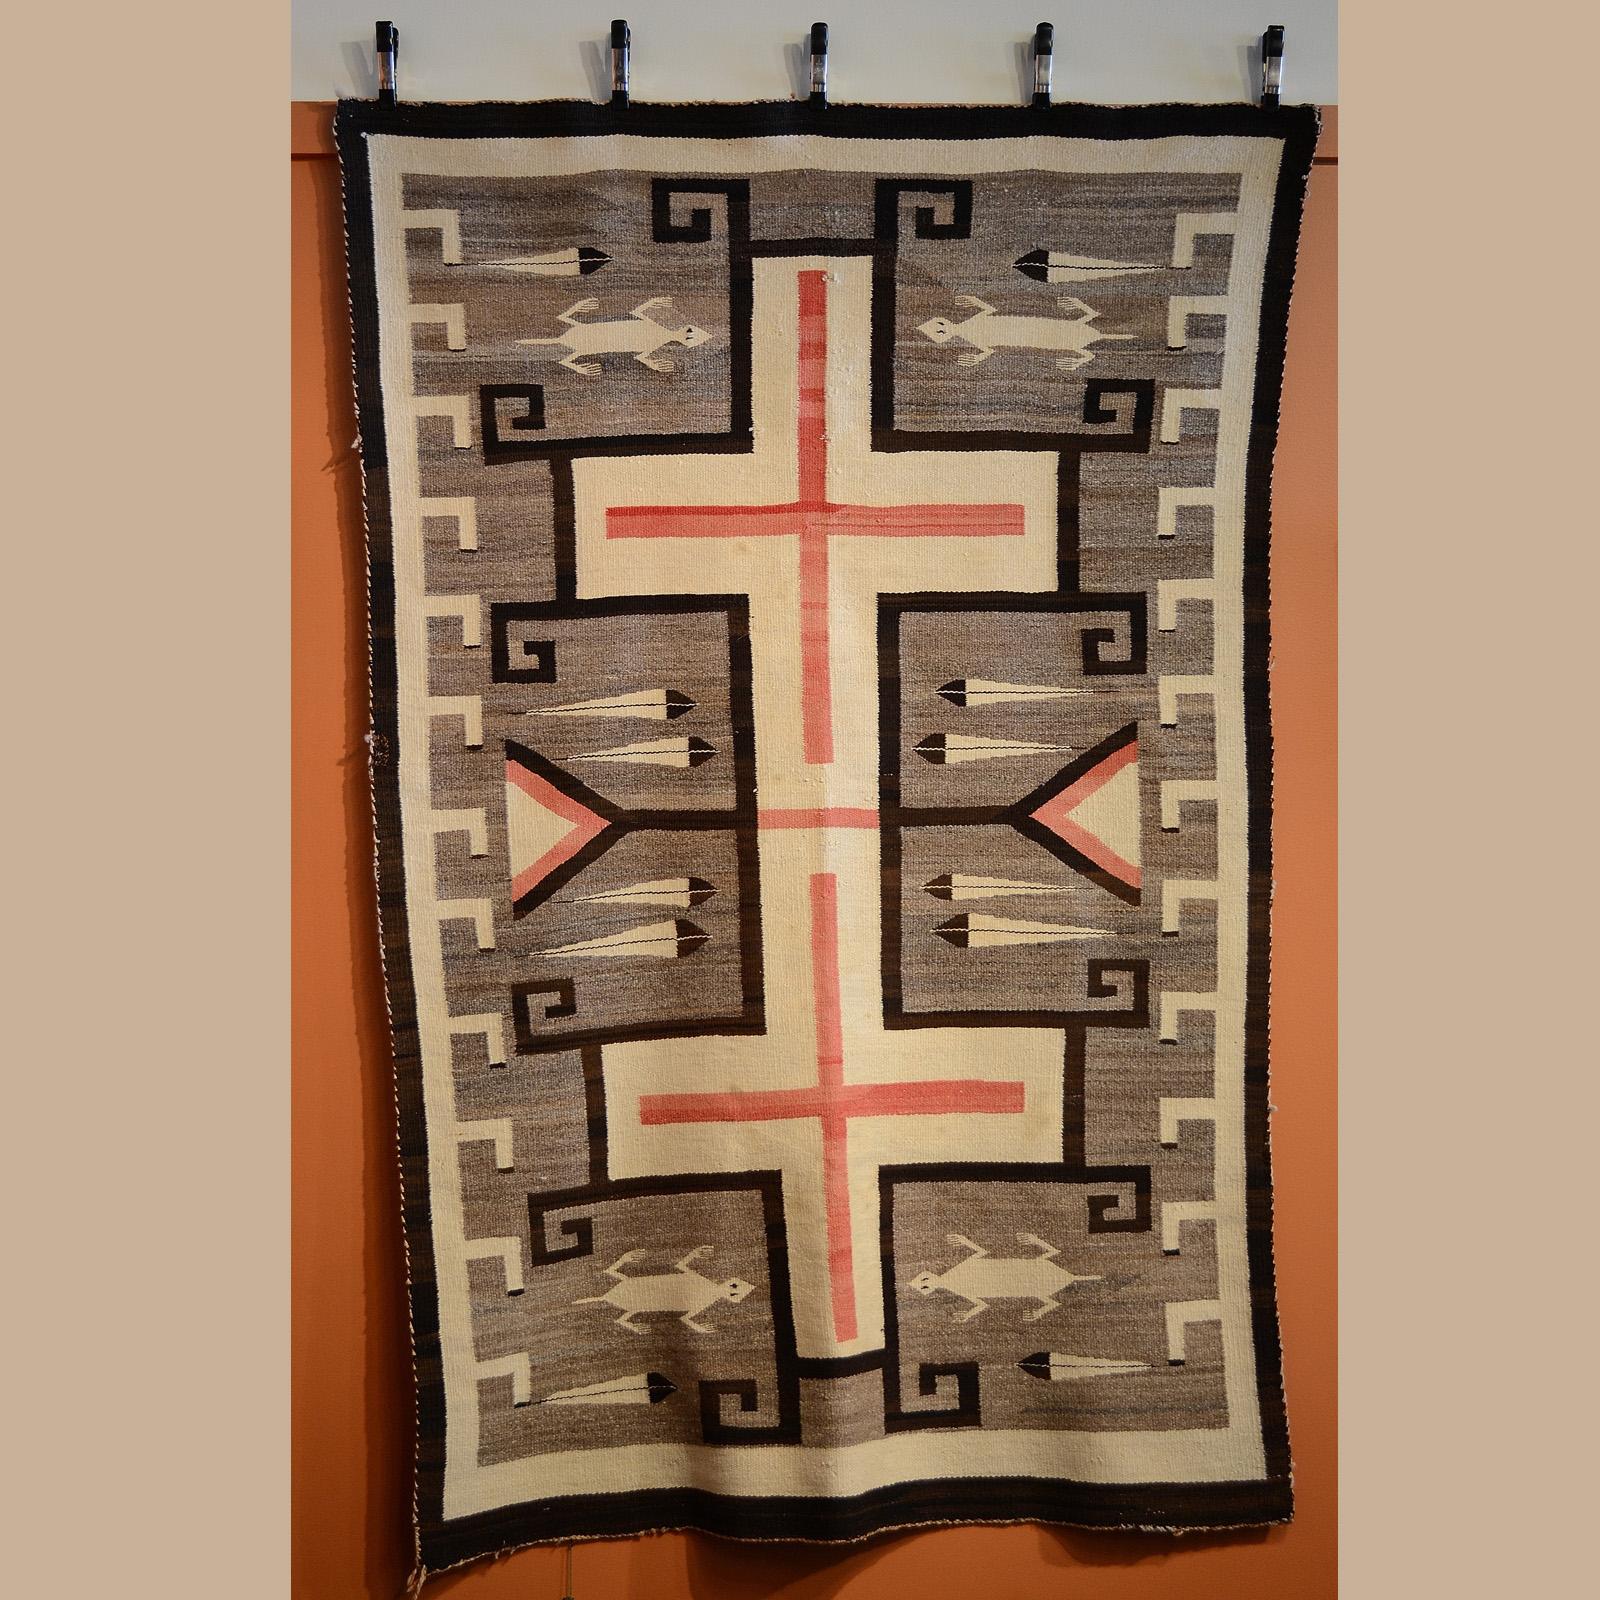 Navajo rug for sale daltons american decorative arts antiques indian art navajo rugs biocorpaavc Images